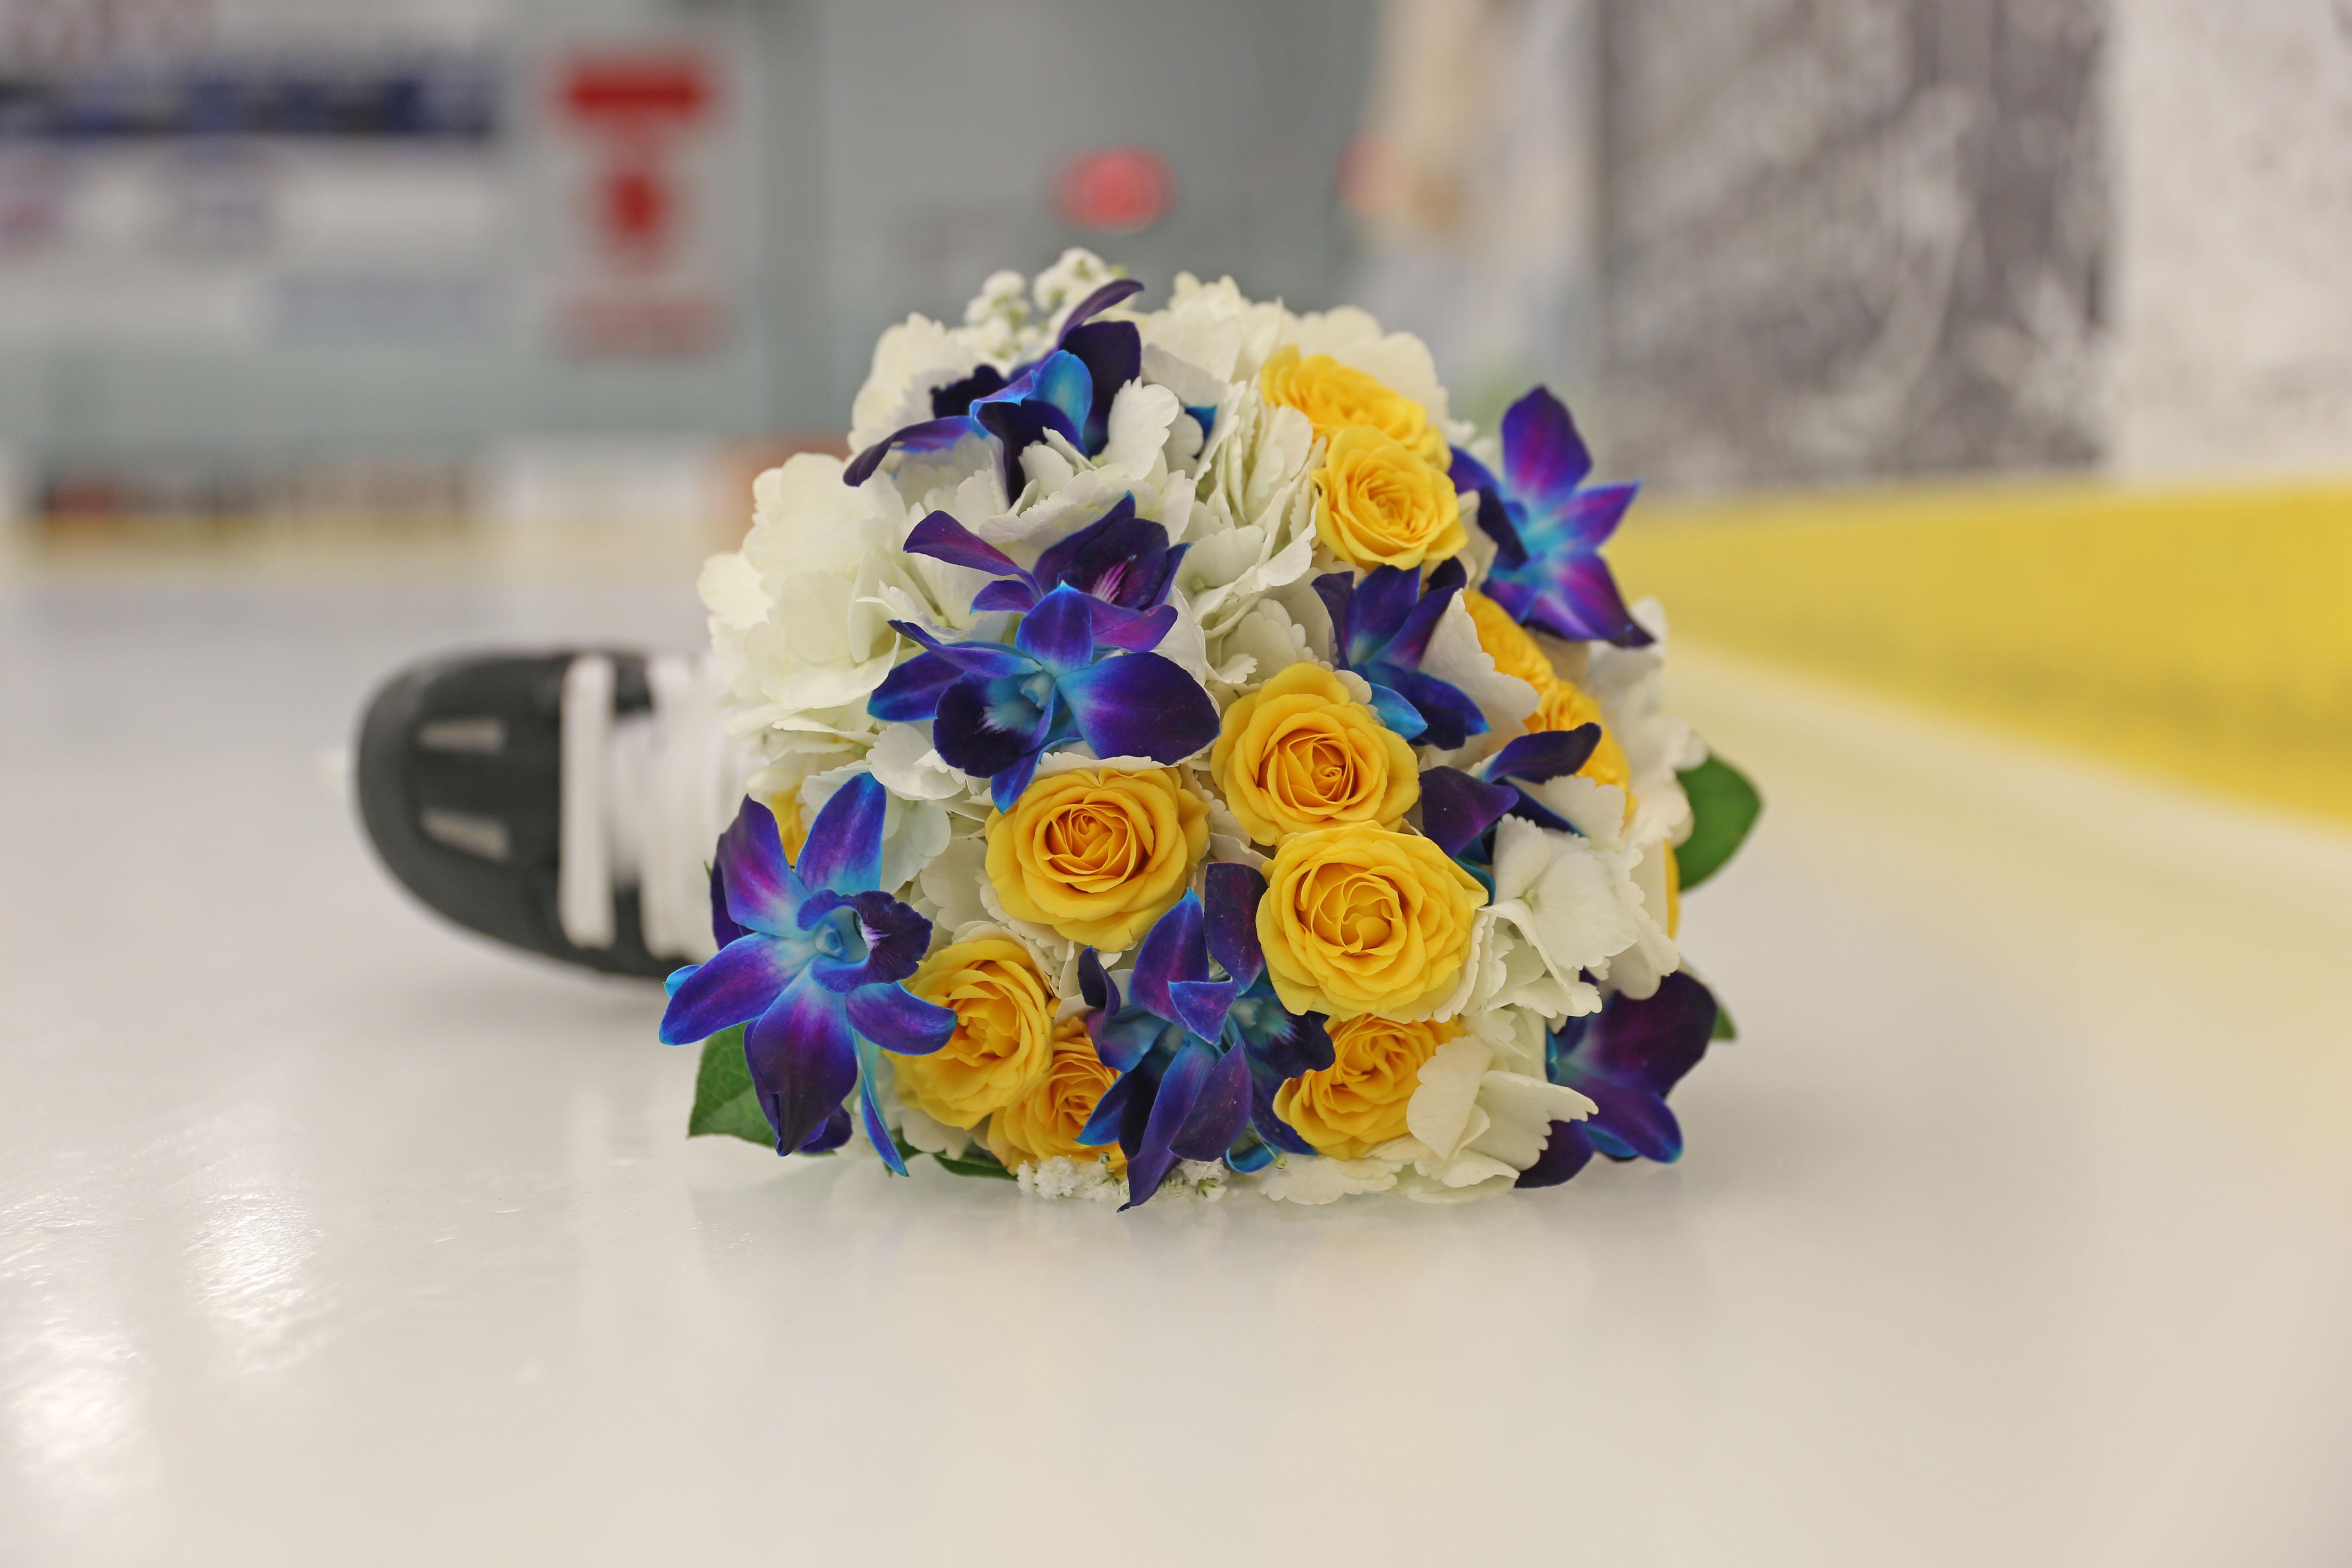 Flowers on Hockey Rink